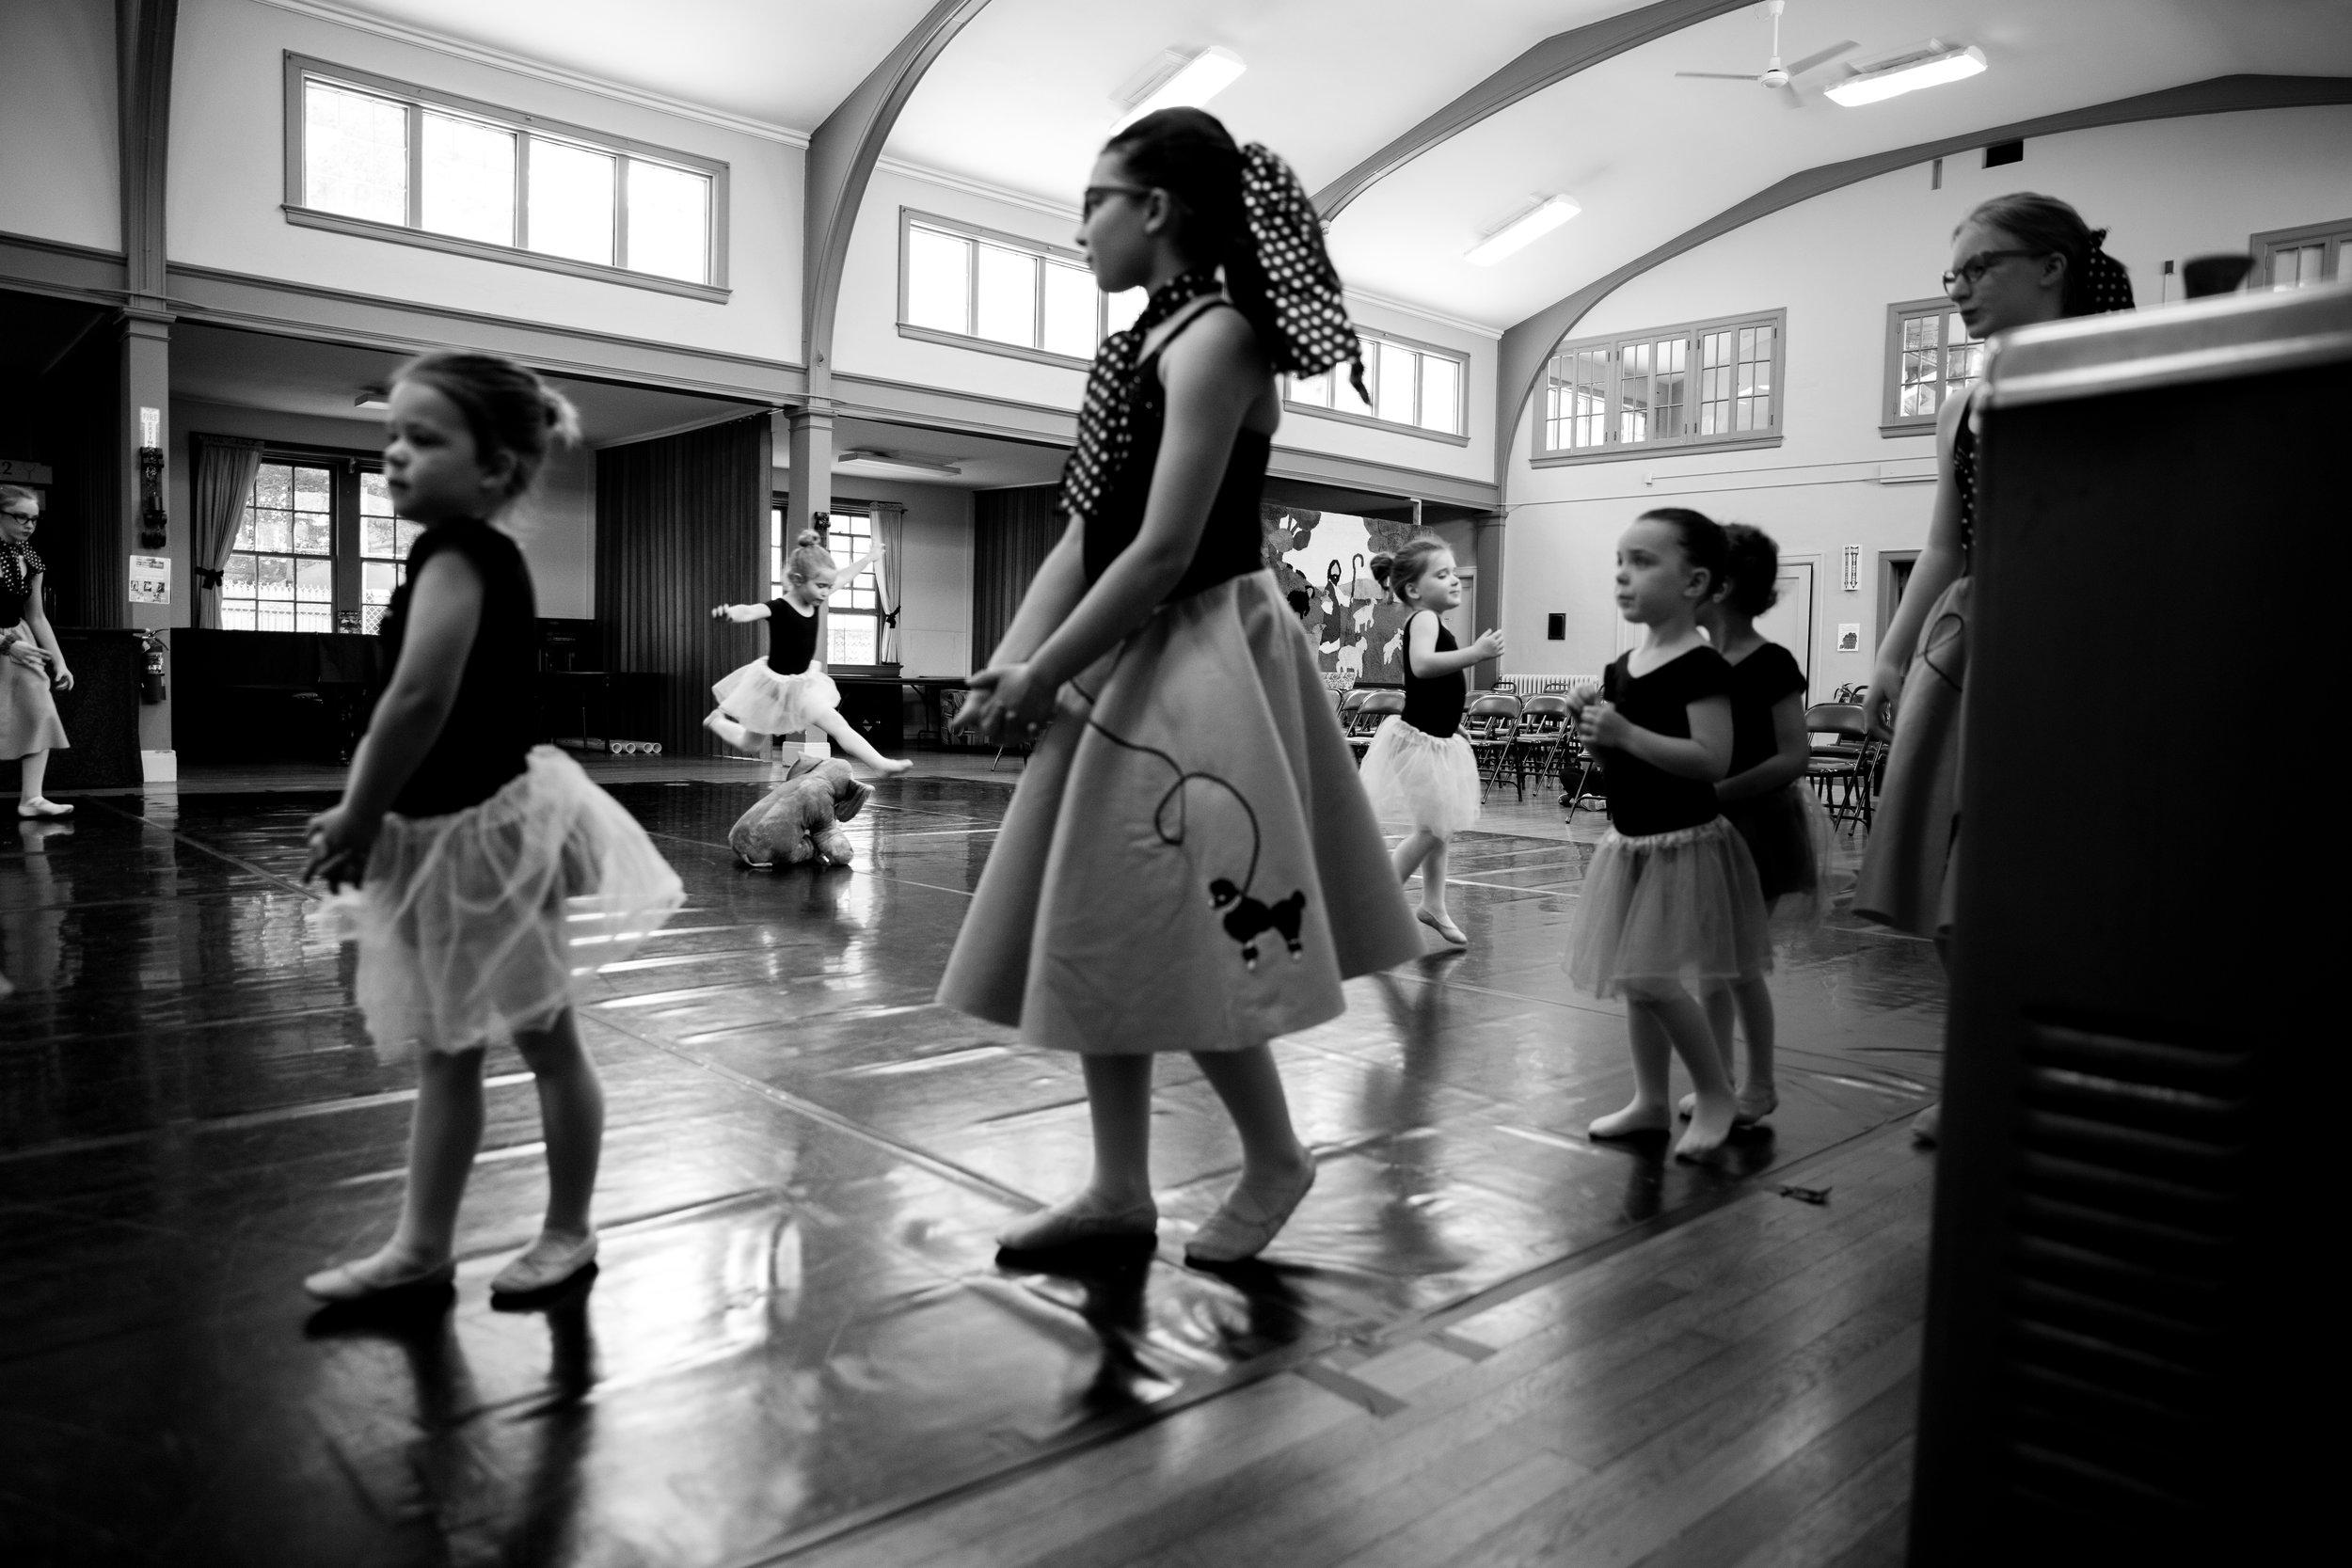 AKZPhotographyWNYbuffaloballetfestivalschoolofballet19211.jpg